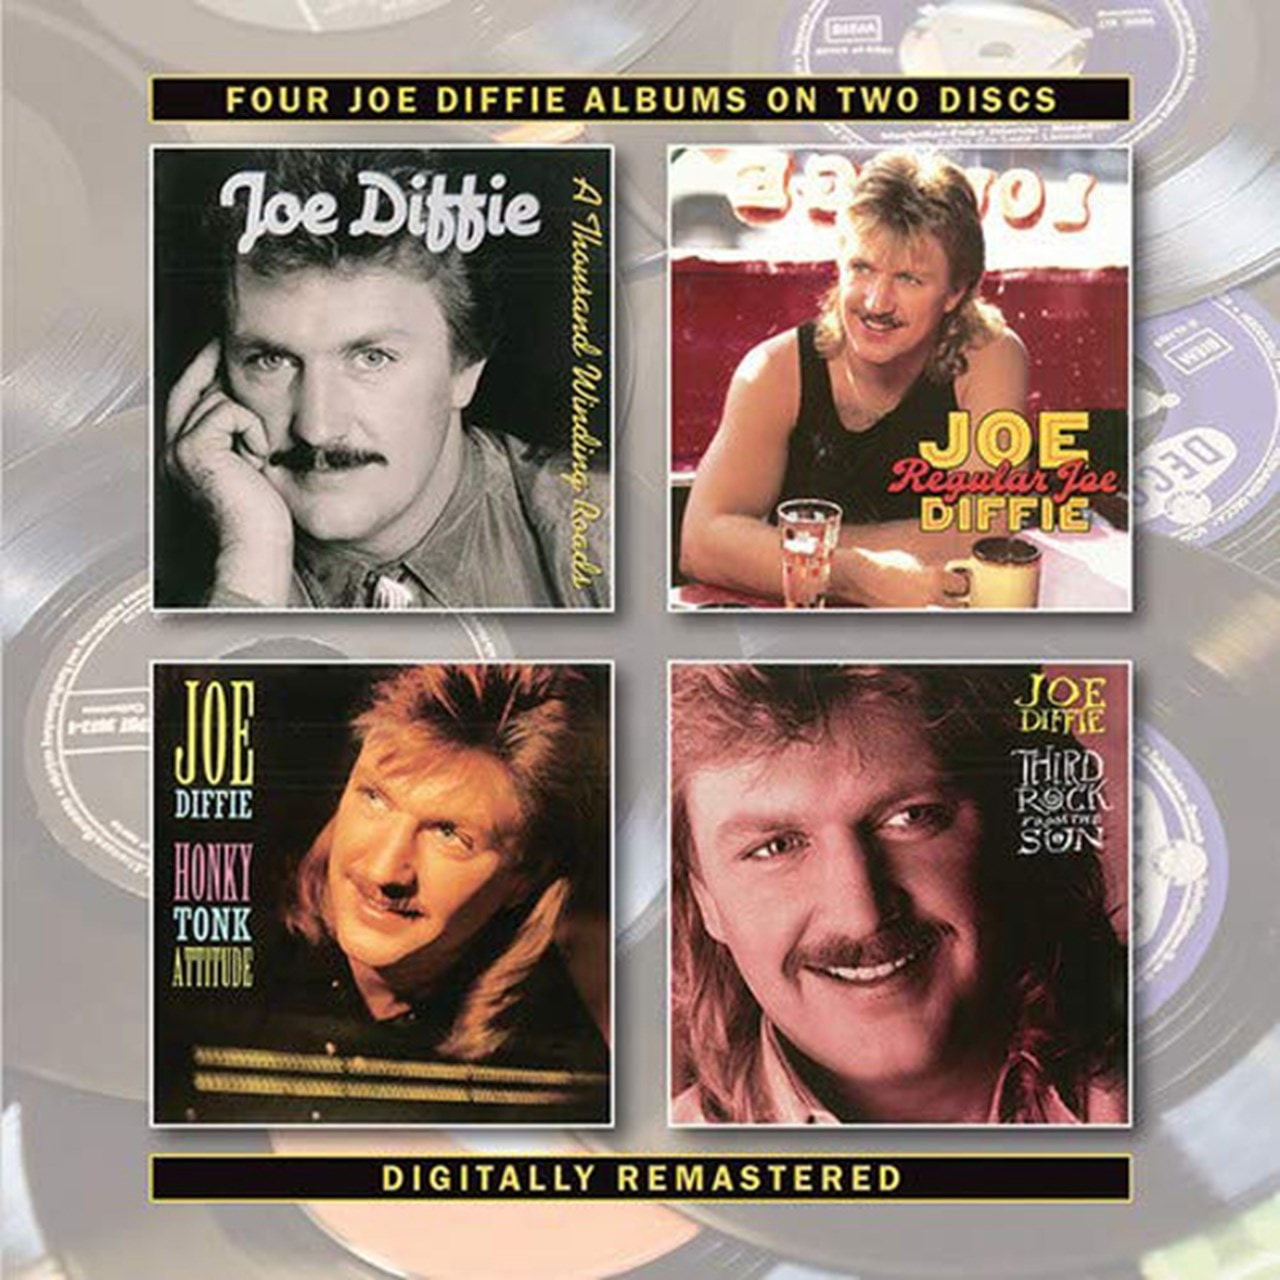 A Thousand Winding Roads/Regular Joe/Honky Tonk Attitude/... - 1